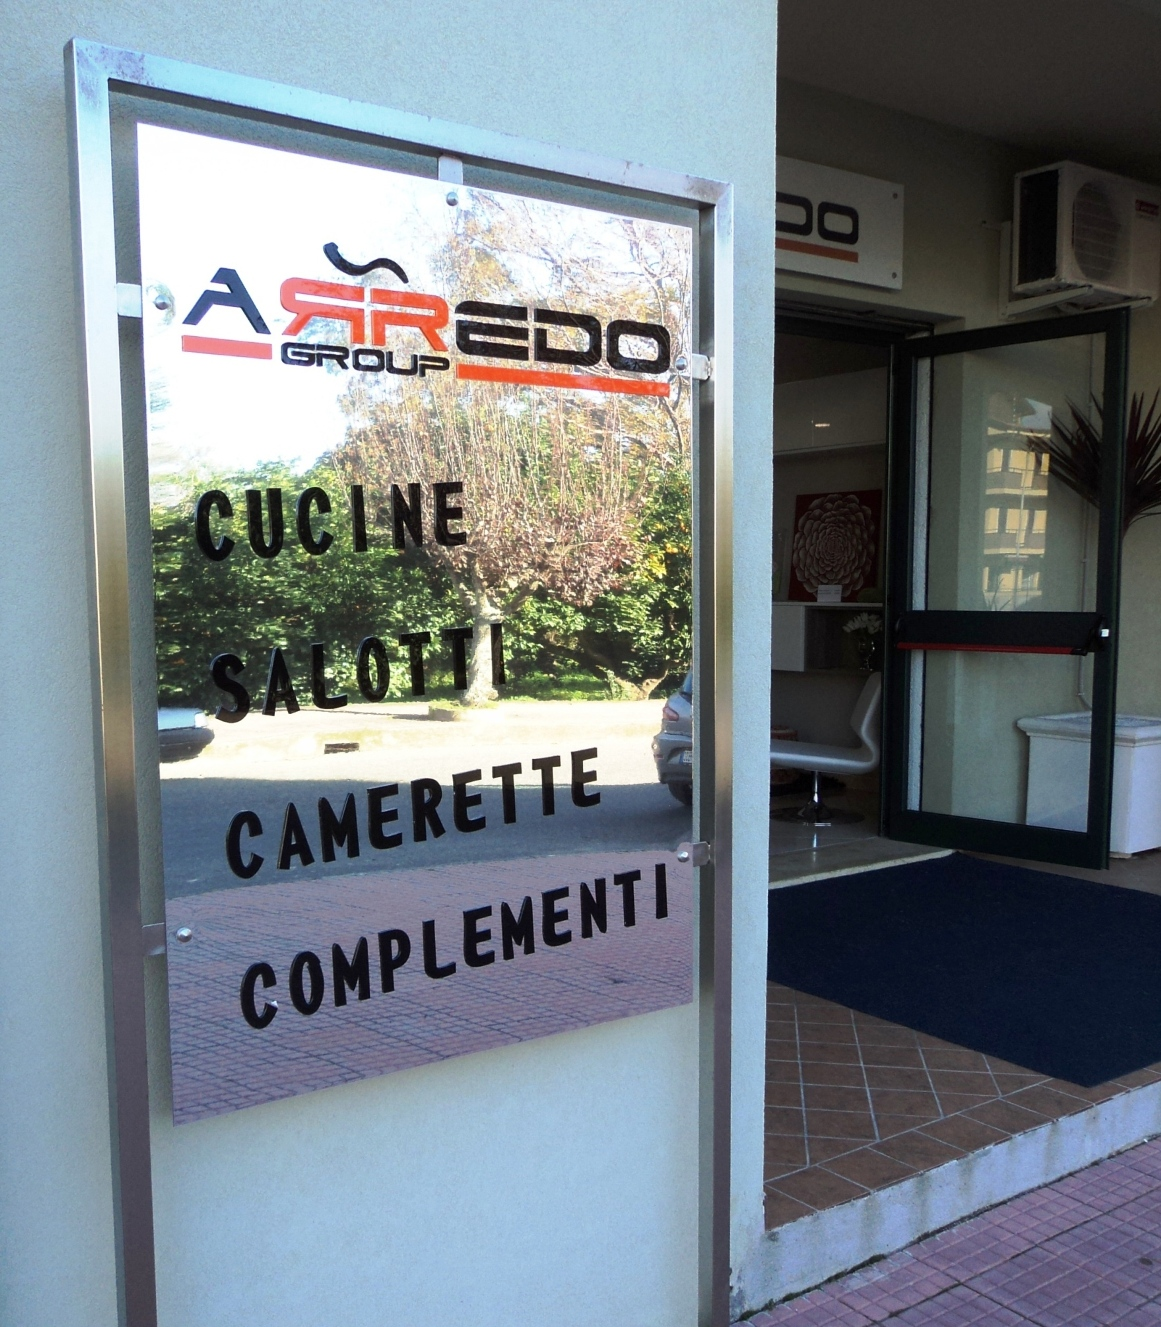 Mobili e arredamenti arredo group acconia di curinga for Arredo group